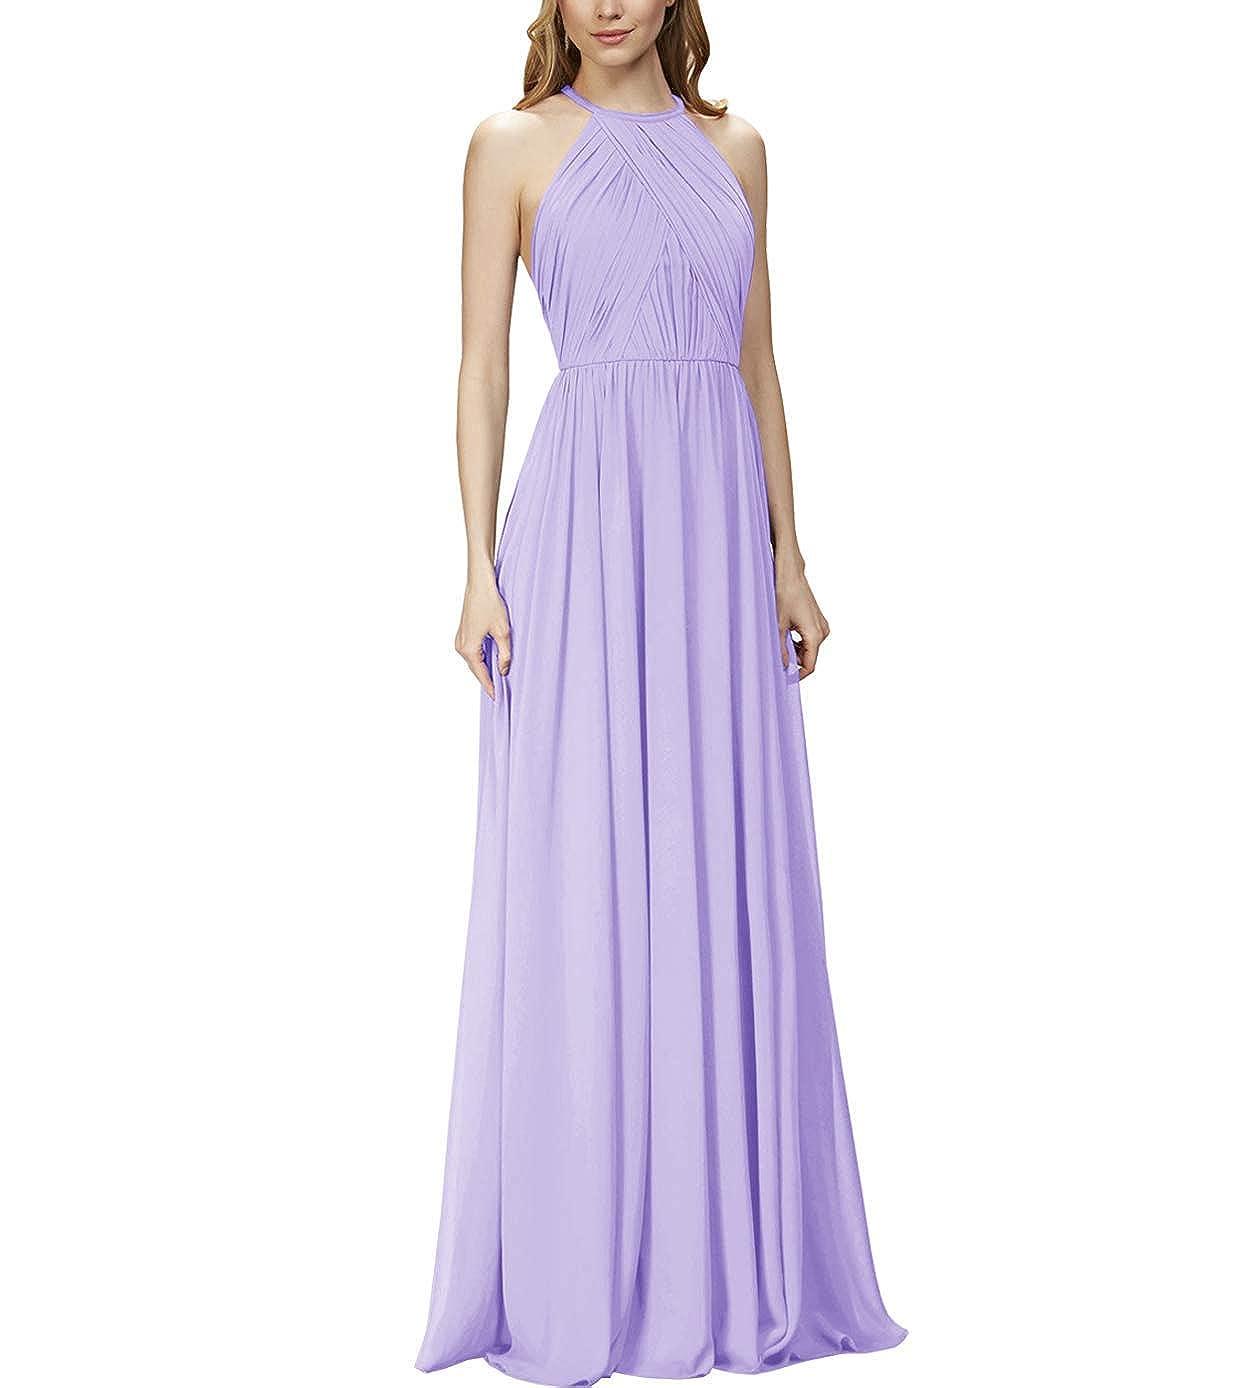 purplec NewFex Halter Long Bridesmaid Dresses 2019 Aline Ruffled Formal Women's Evening Gown